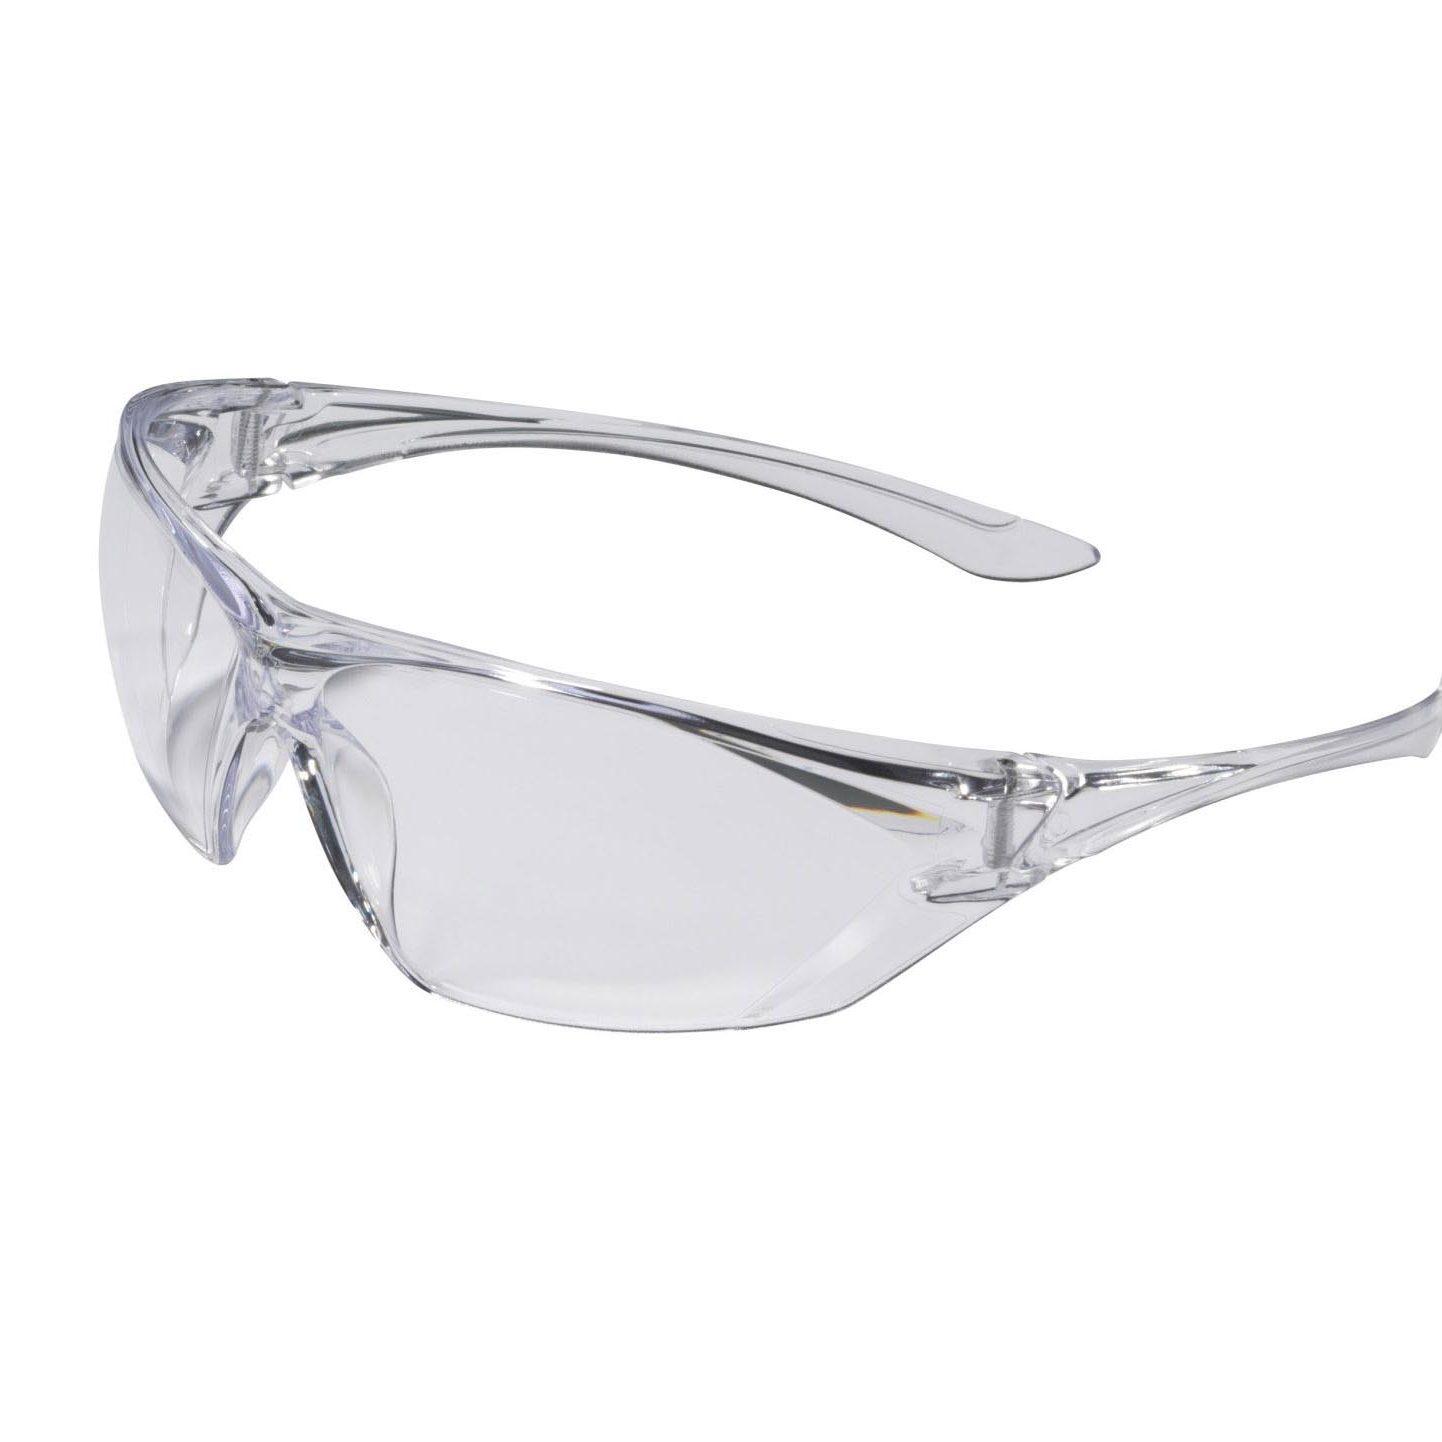 safetyglasses copy